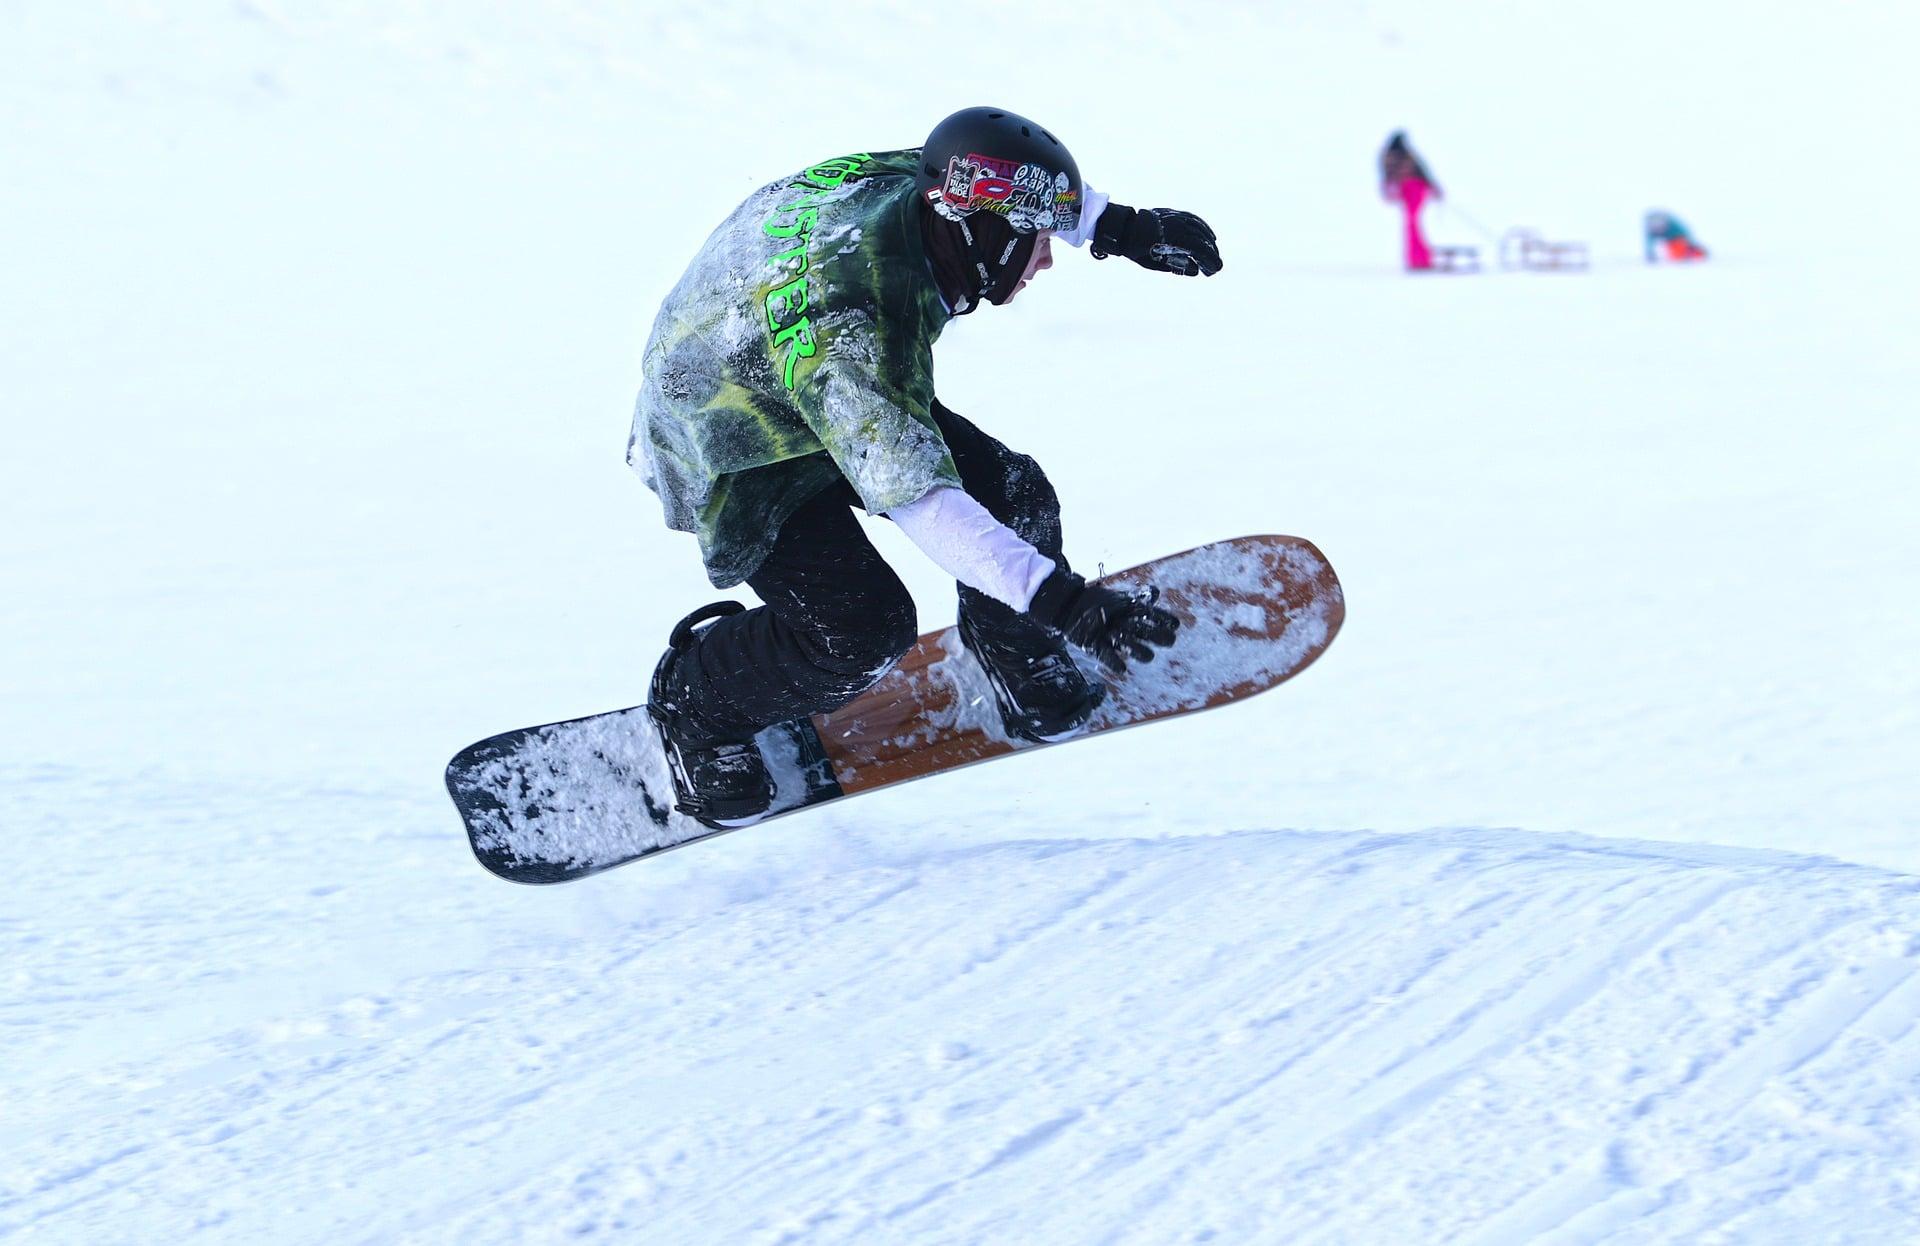 snowboarding snow pixabay